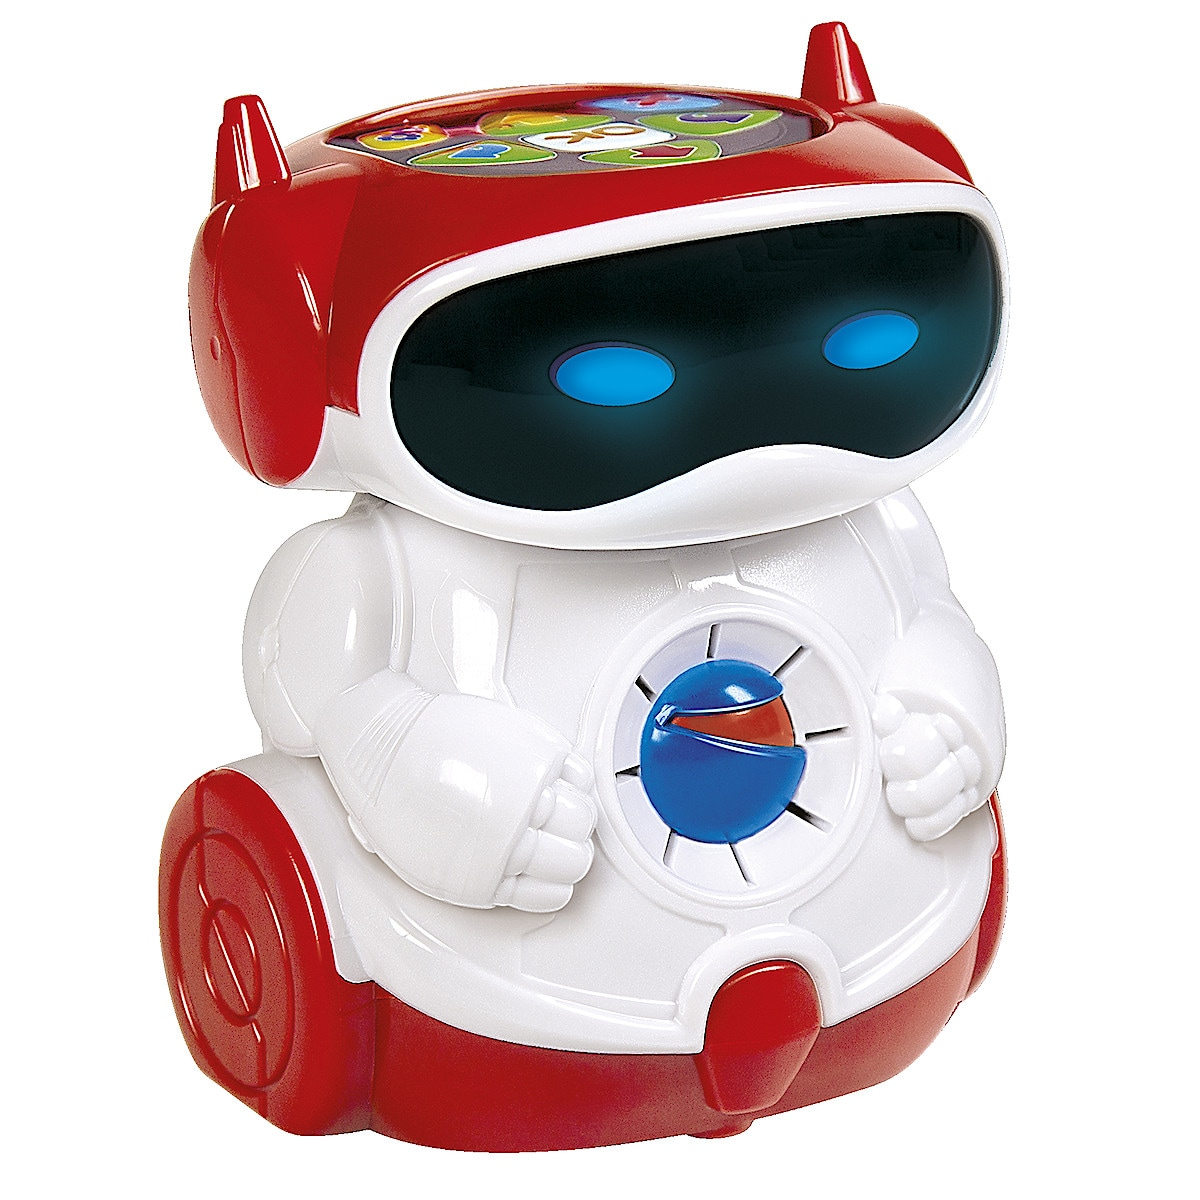 DOC Educational Talking Robot Clementoni